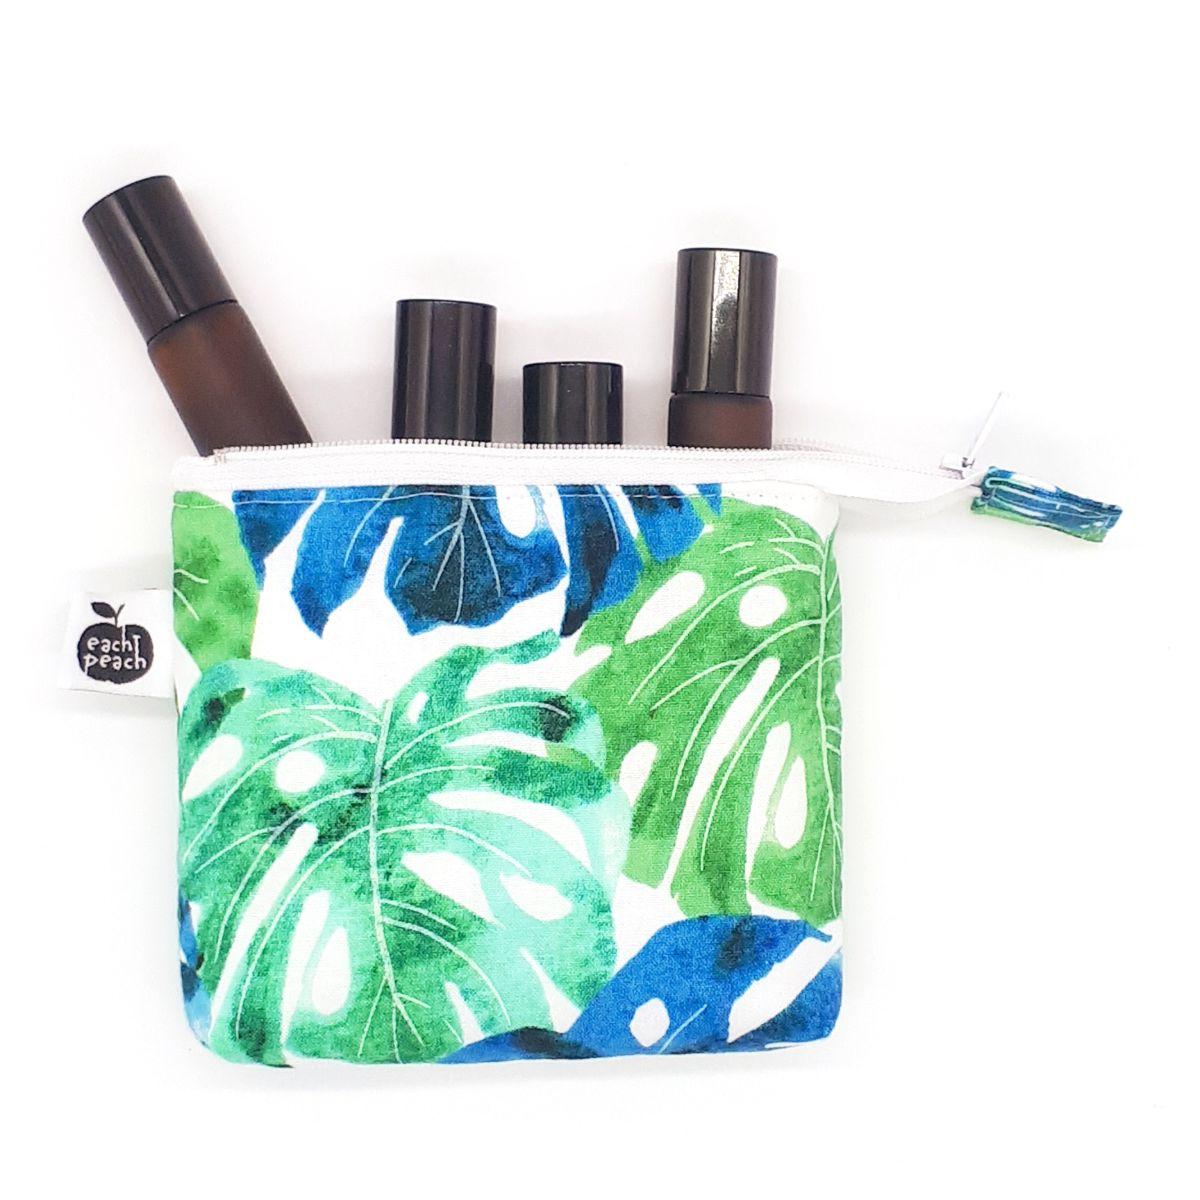 foliage-roller-bottle-pouch